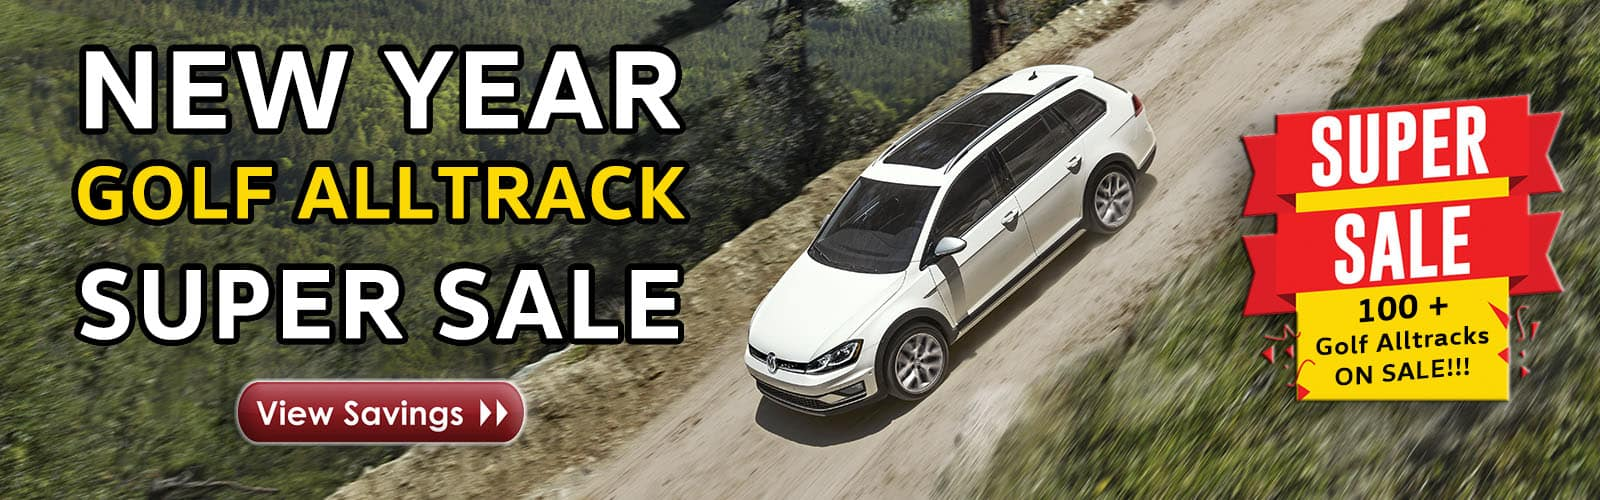 VW Alltrack Super Sale in Denver, CO